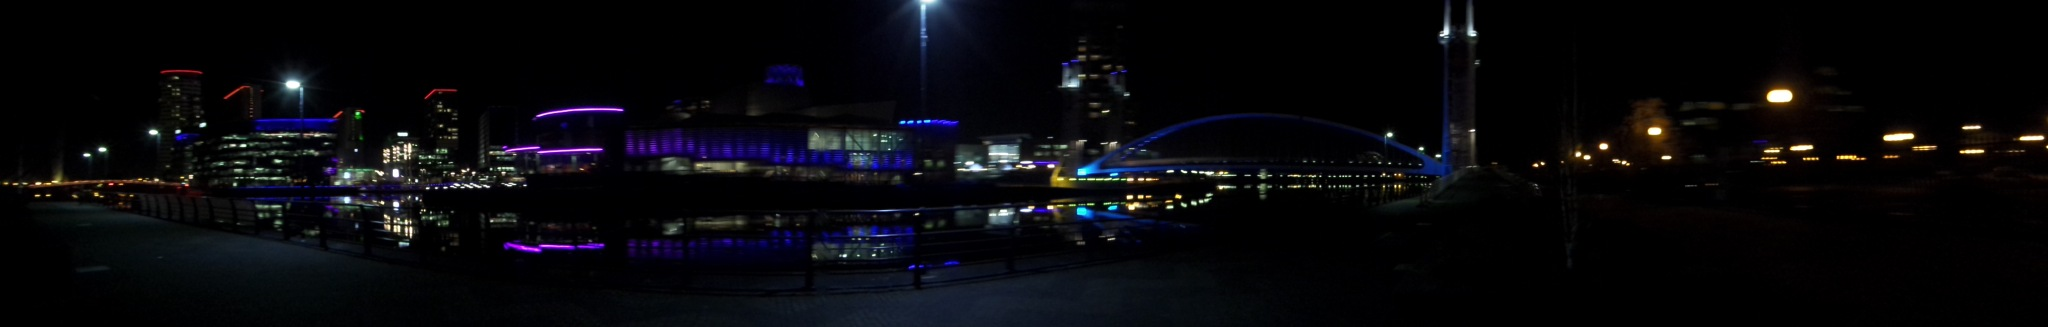 Lowry at Night (Panorama) by brian.f.kirkham